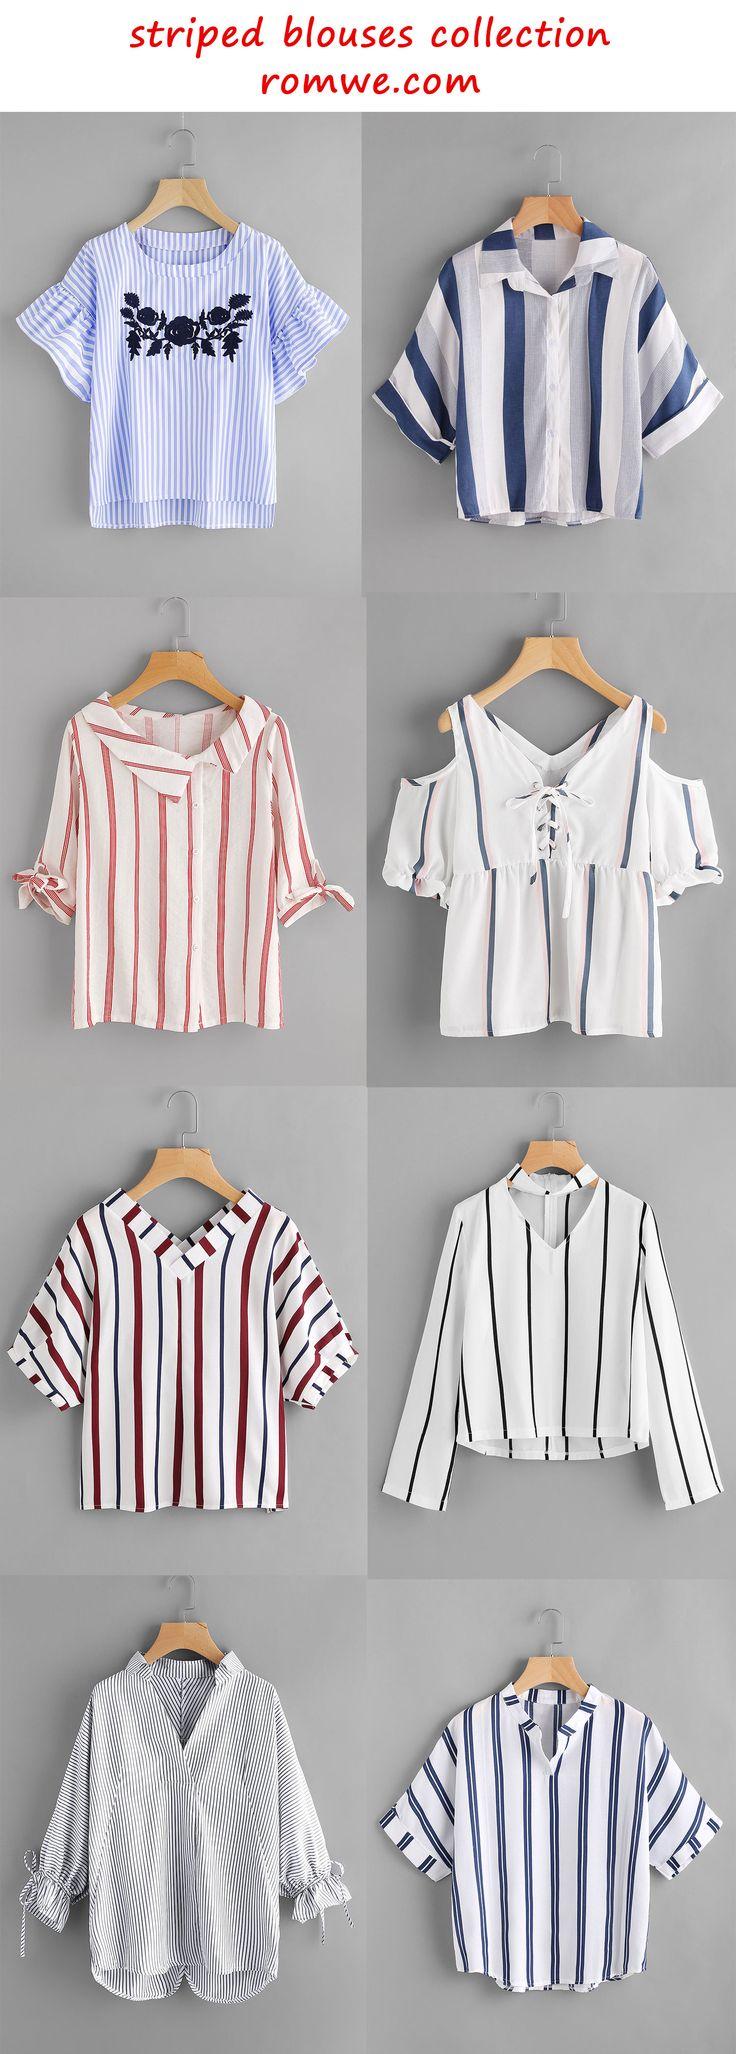 striped blouses 2017 - romwe.com